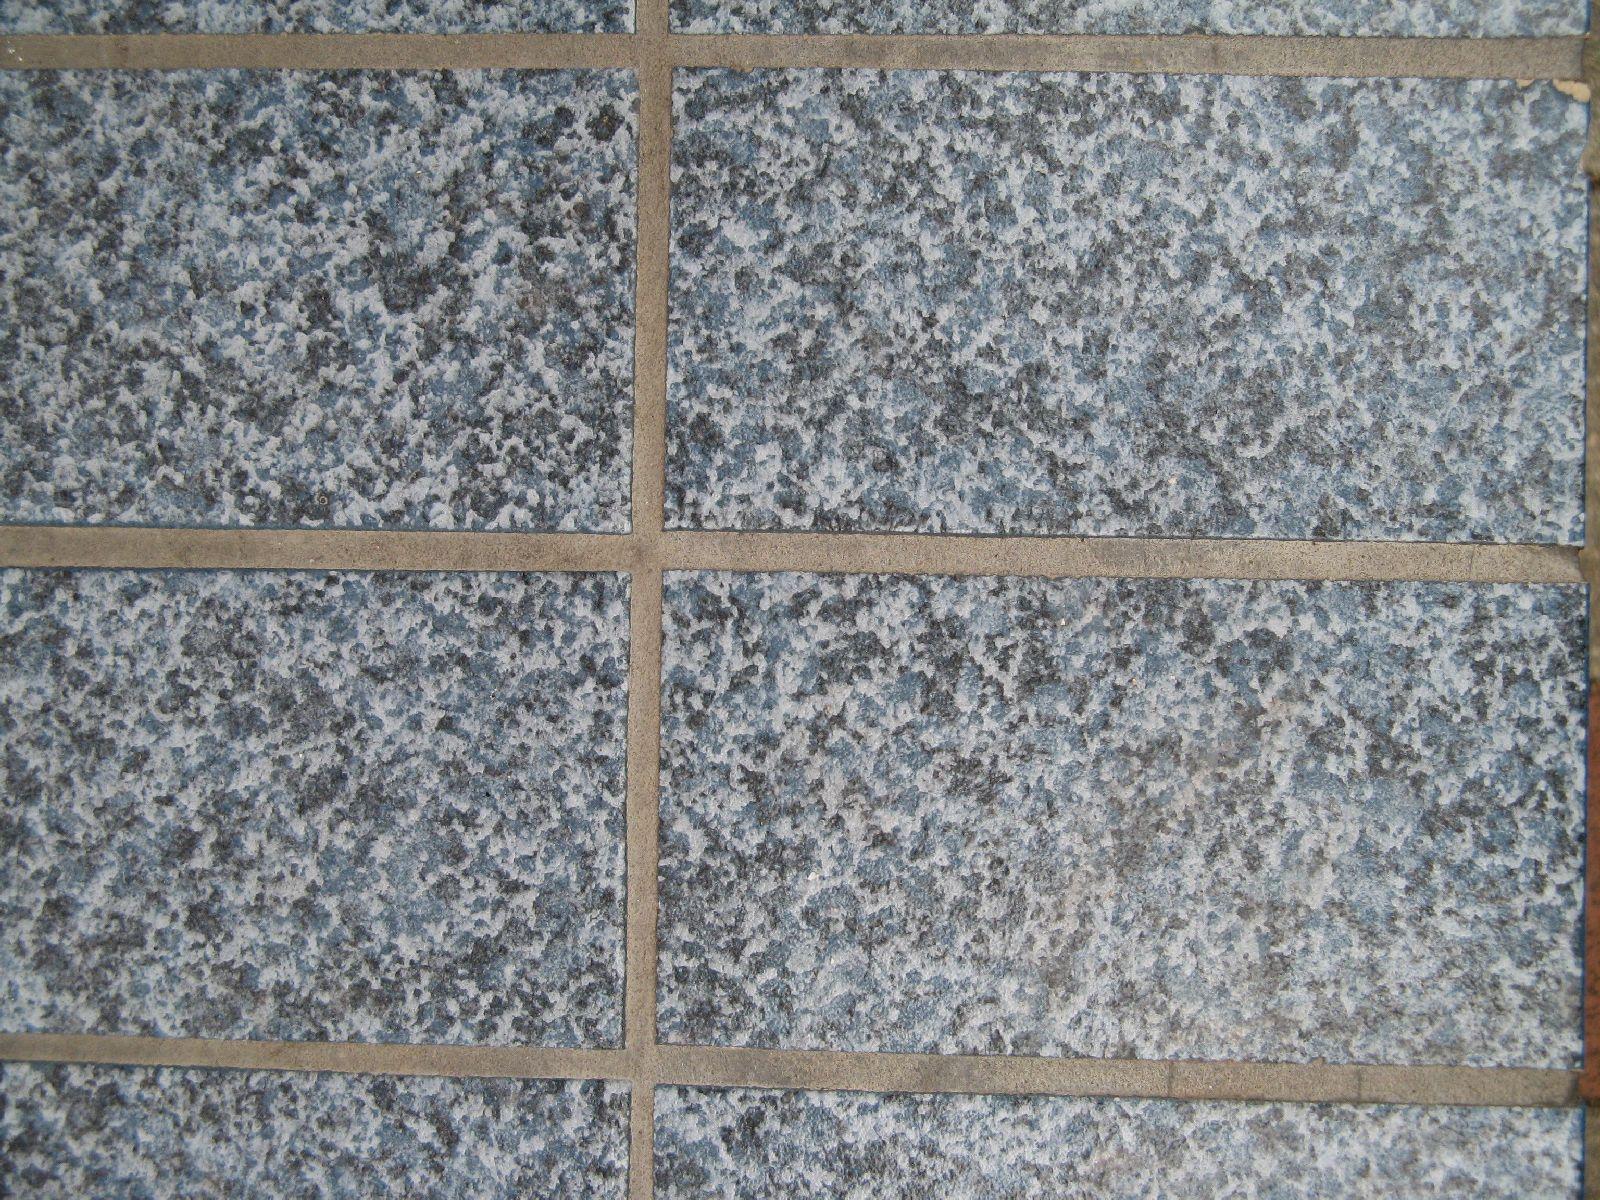 Stone_Texture_B_0908